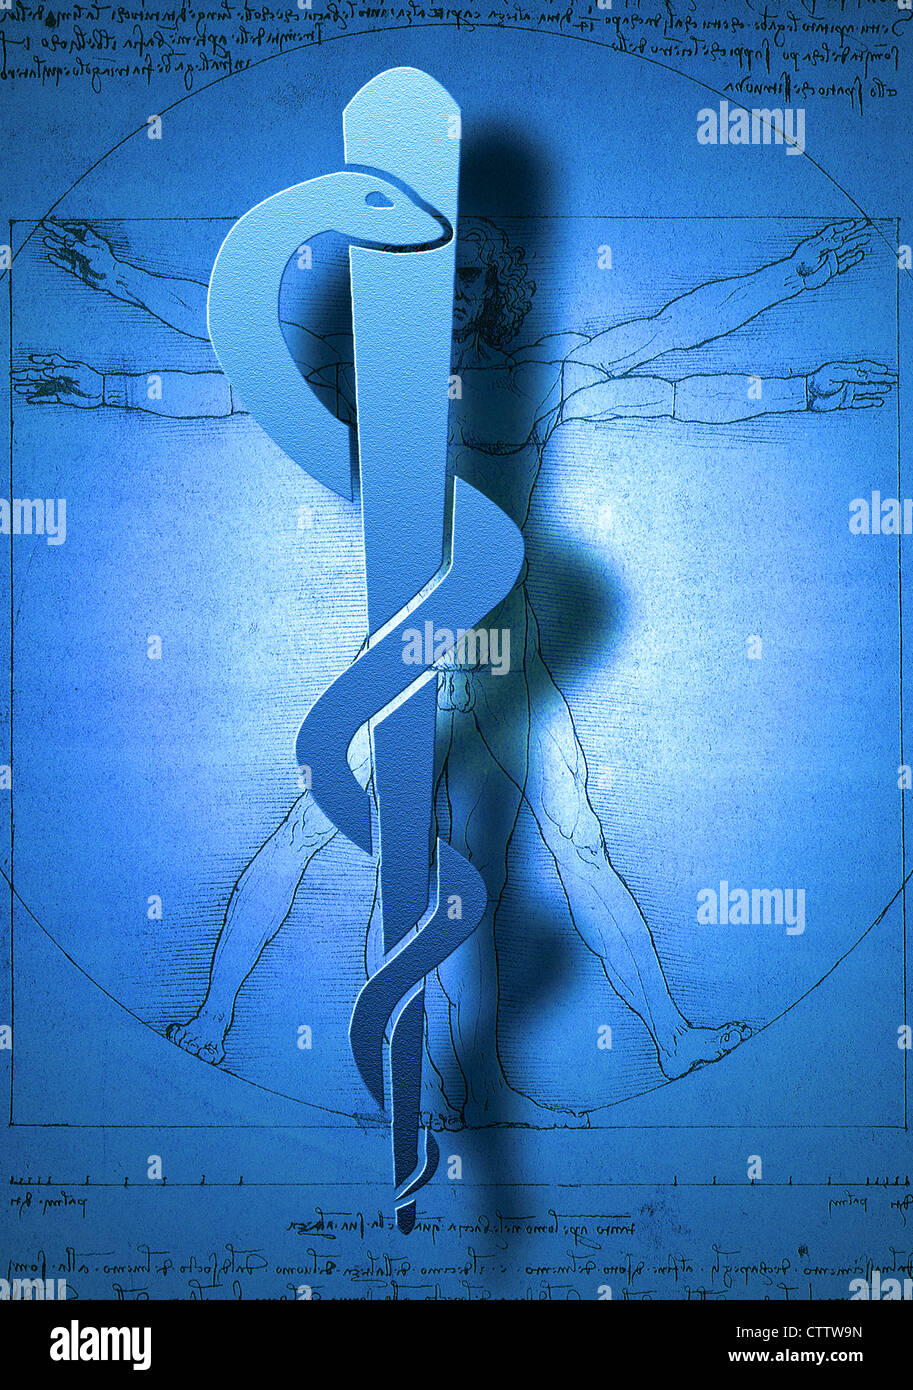 Aeskulap Stab vor Leonardo Da Vincis Menschenbild / Anatomiestudie Immagini Stock